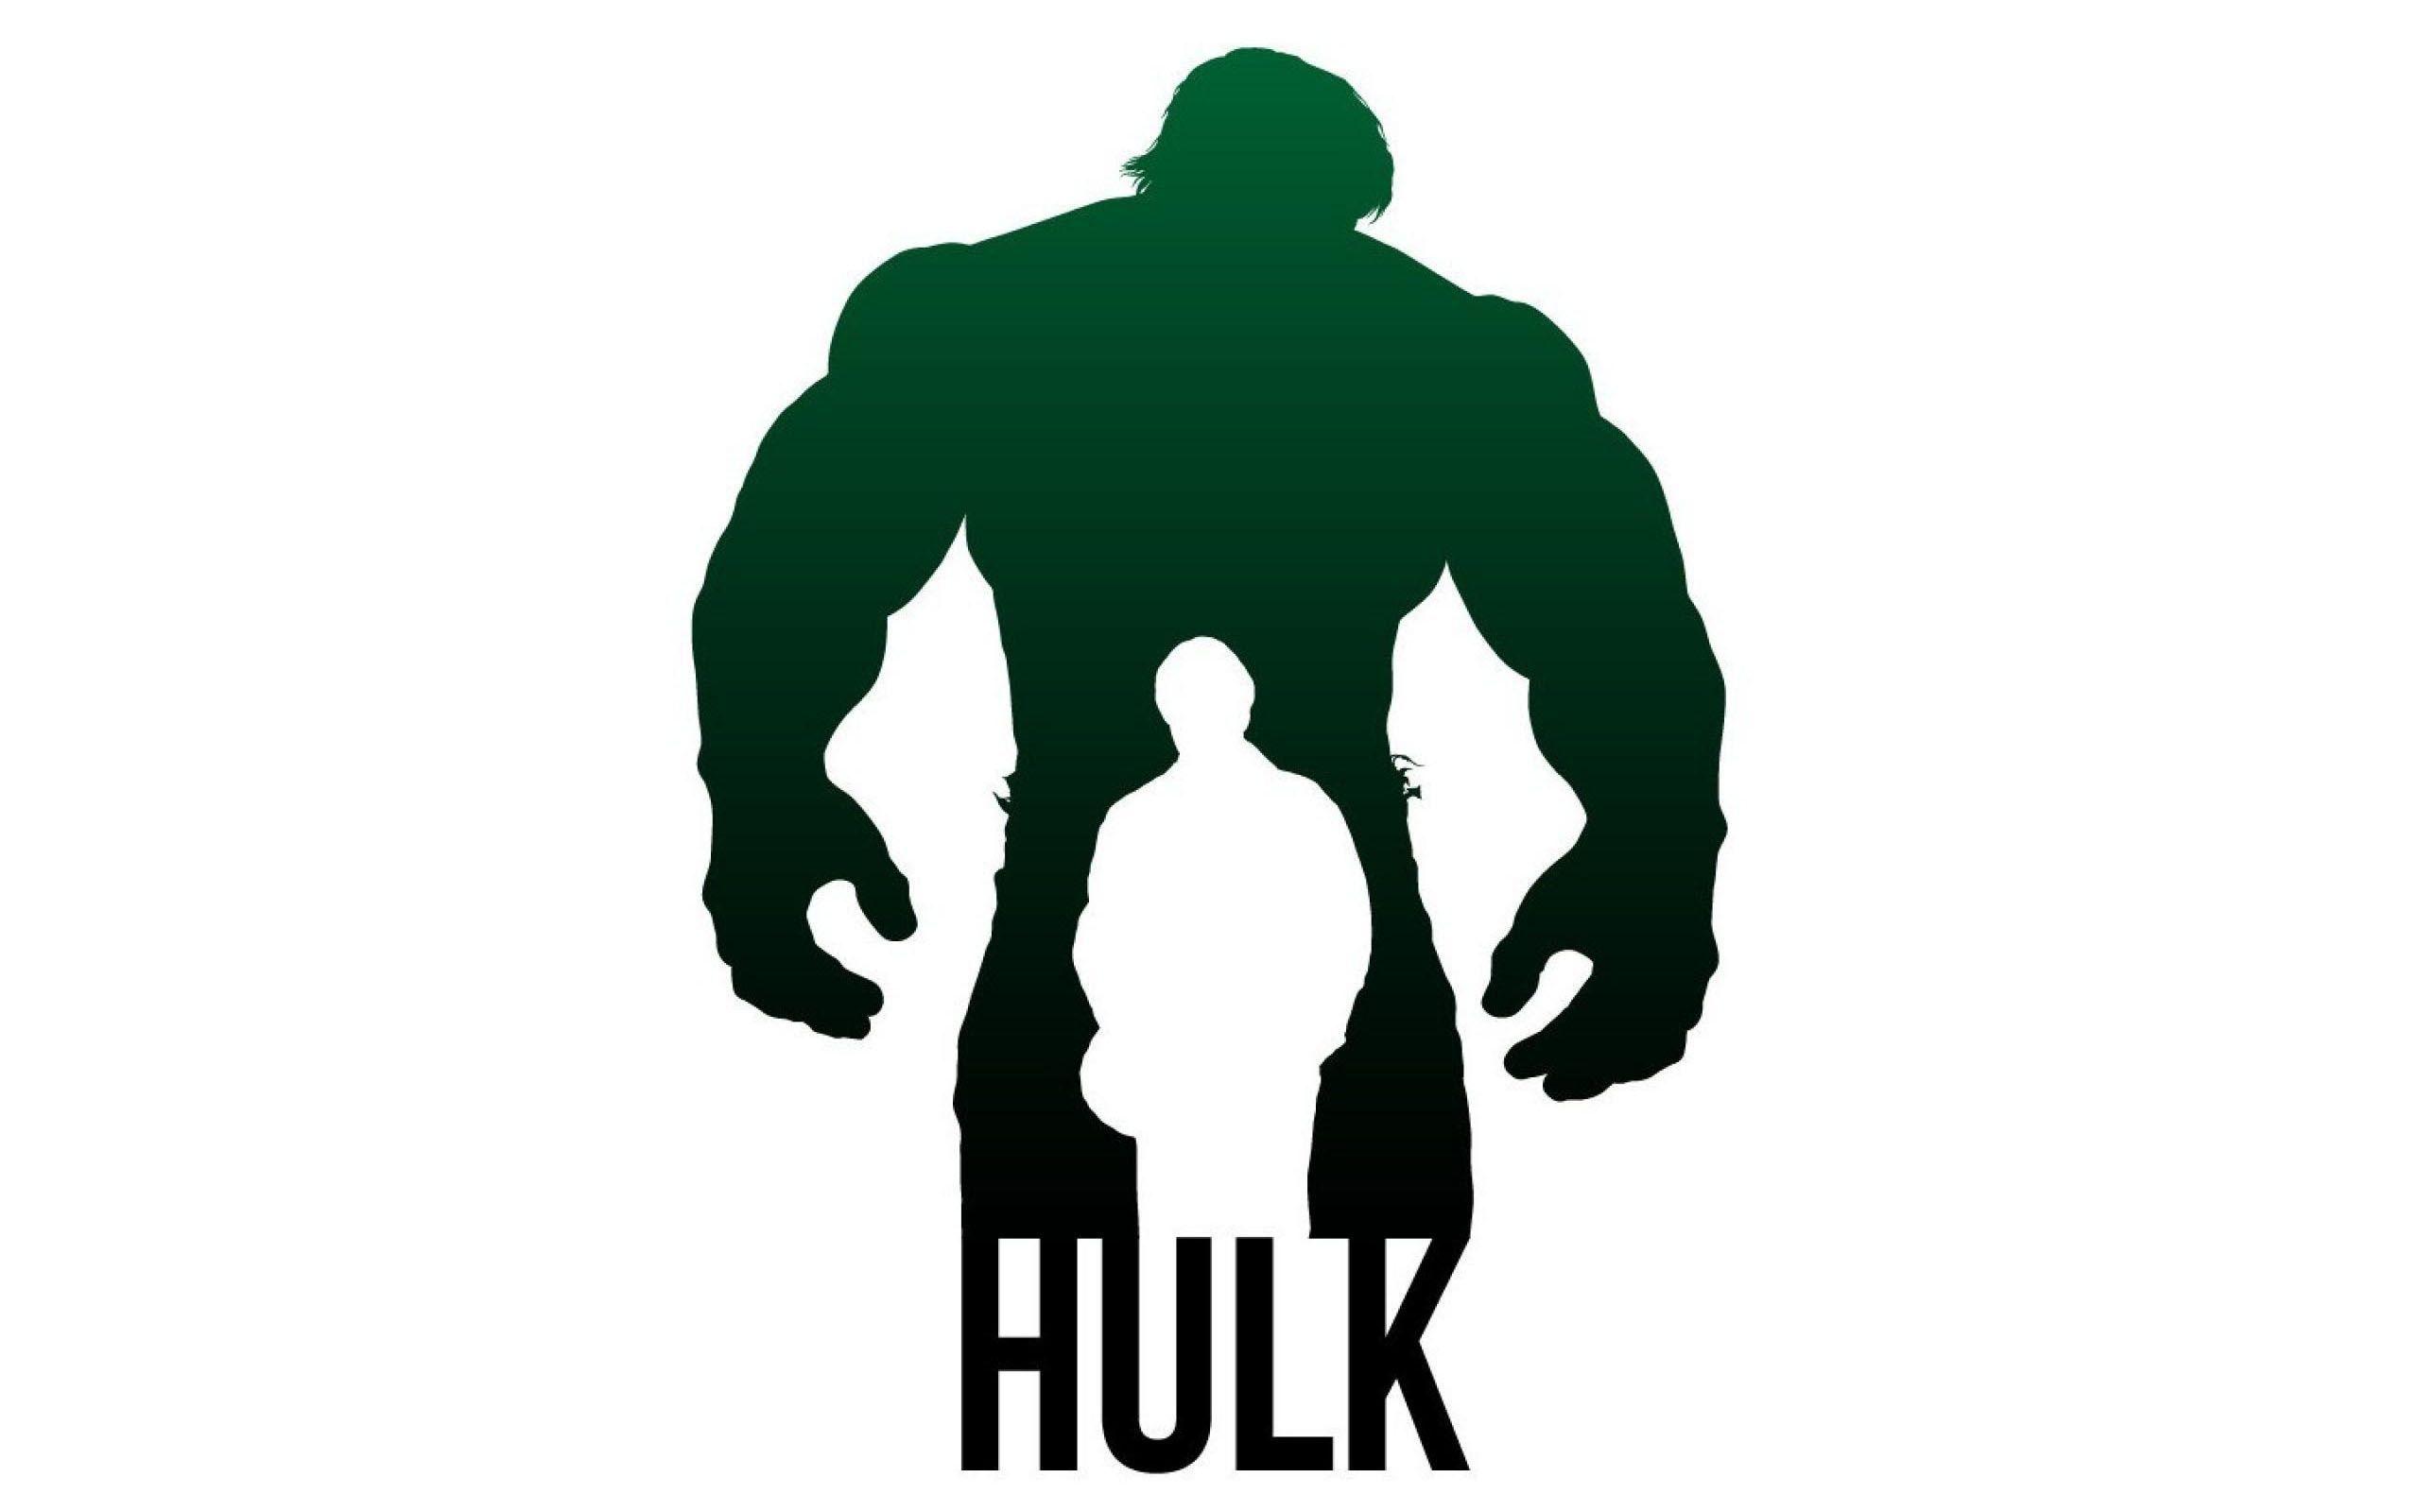 2560x1600 Wallpaper Bruce Banner The Hulk Face Marvel Comics Images For 3d